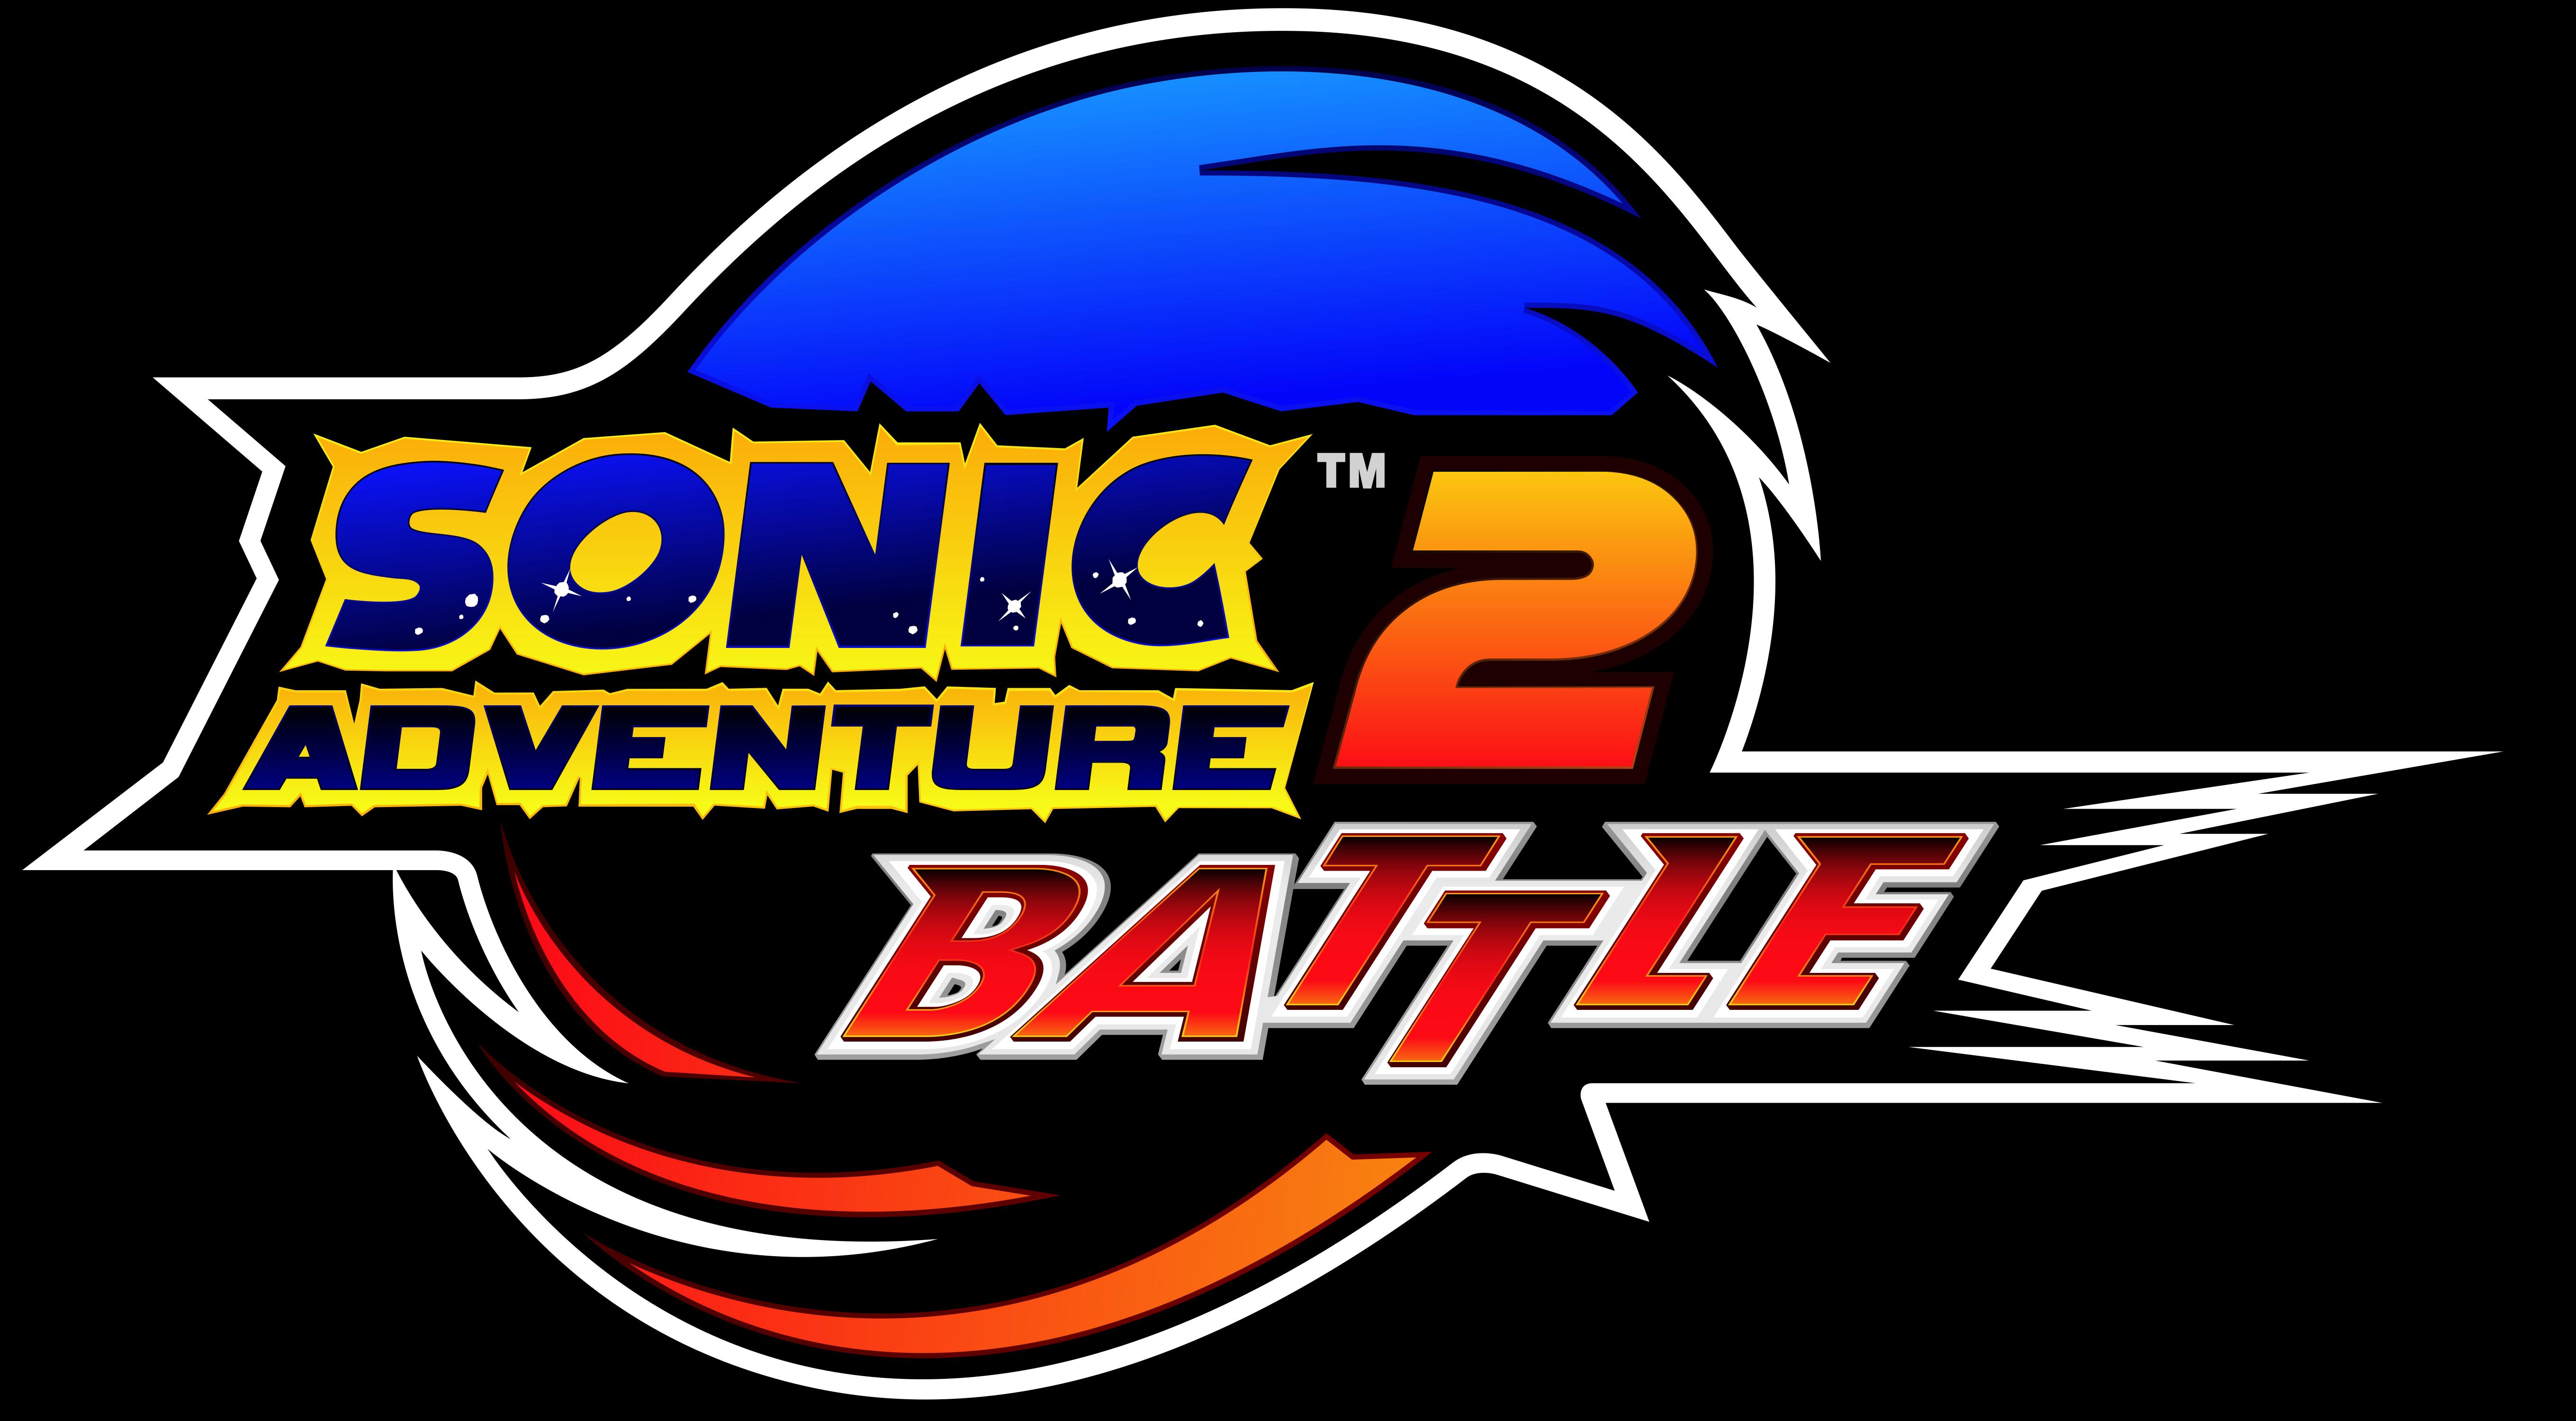 Vector Sonic Adventure 2 Battle Logo By Rapbattleeditor0510 On Deviantart